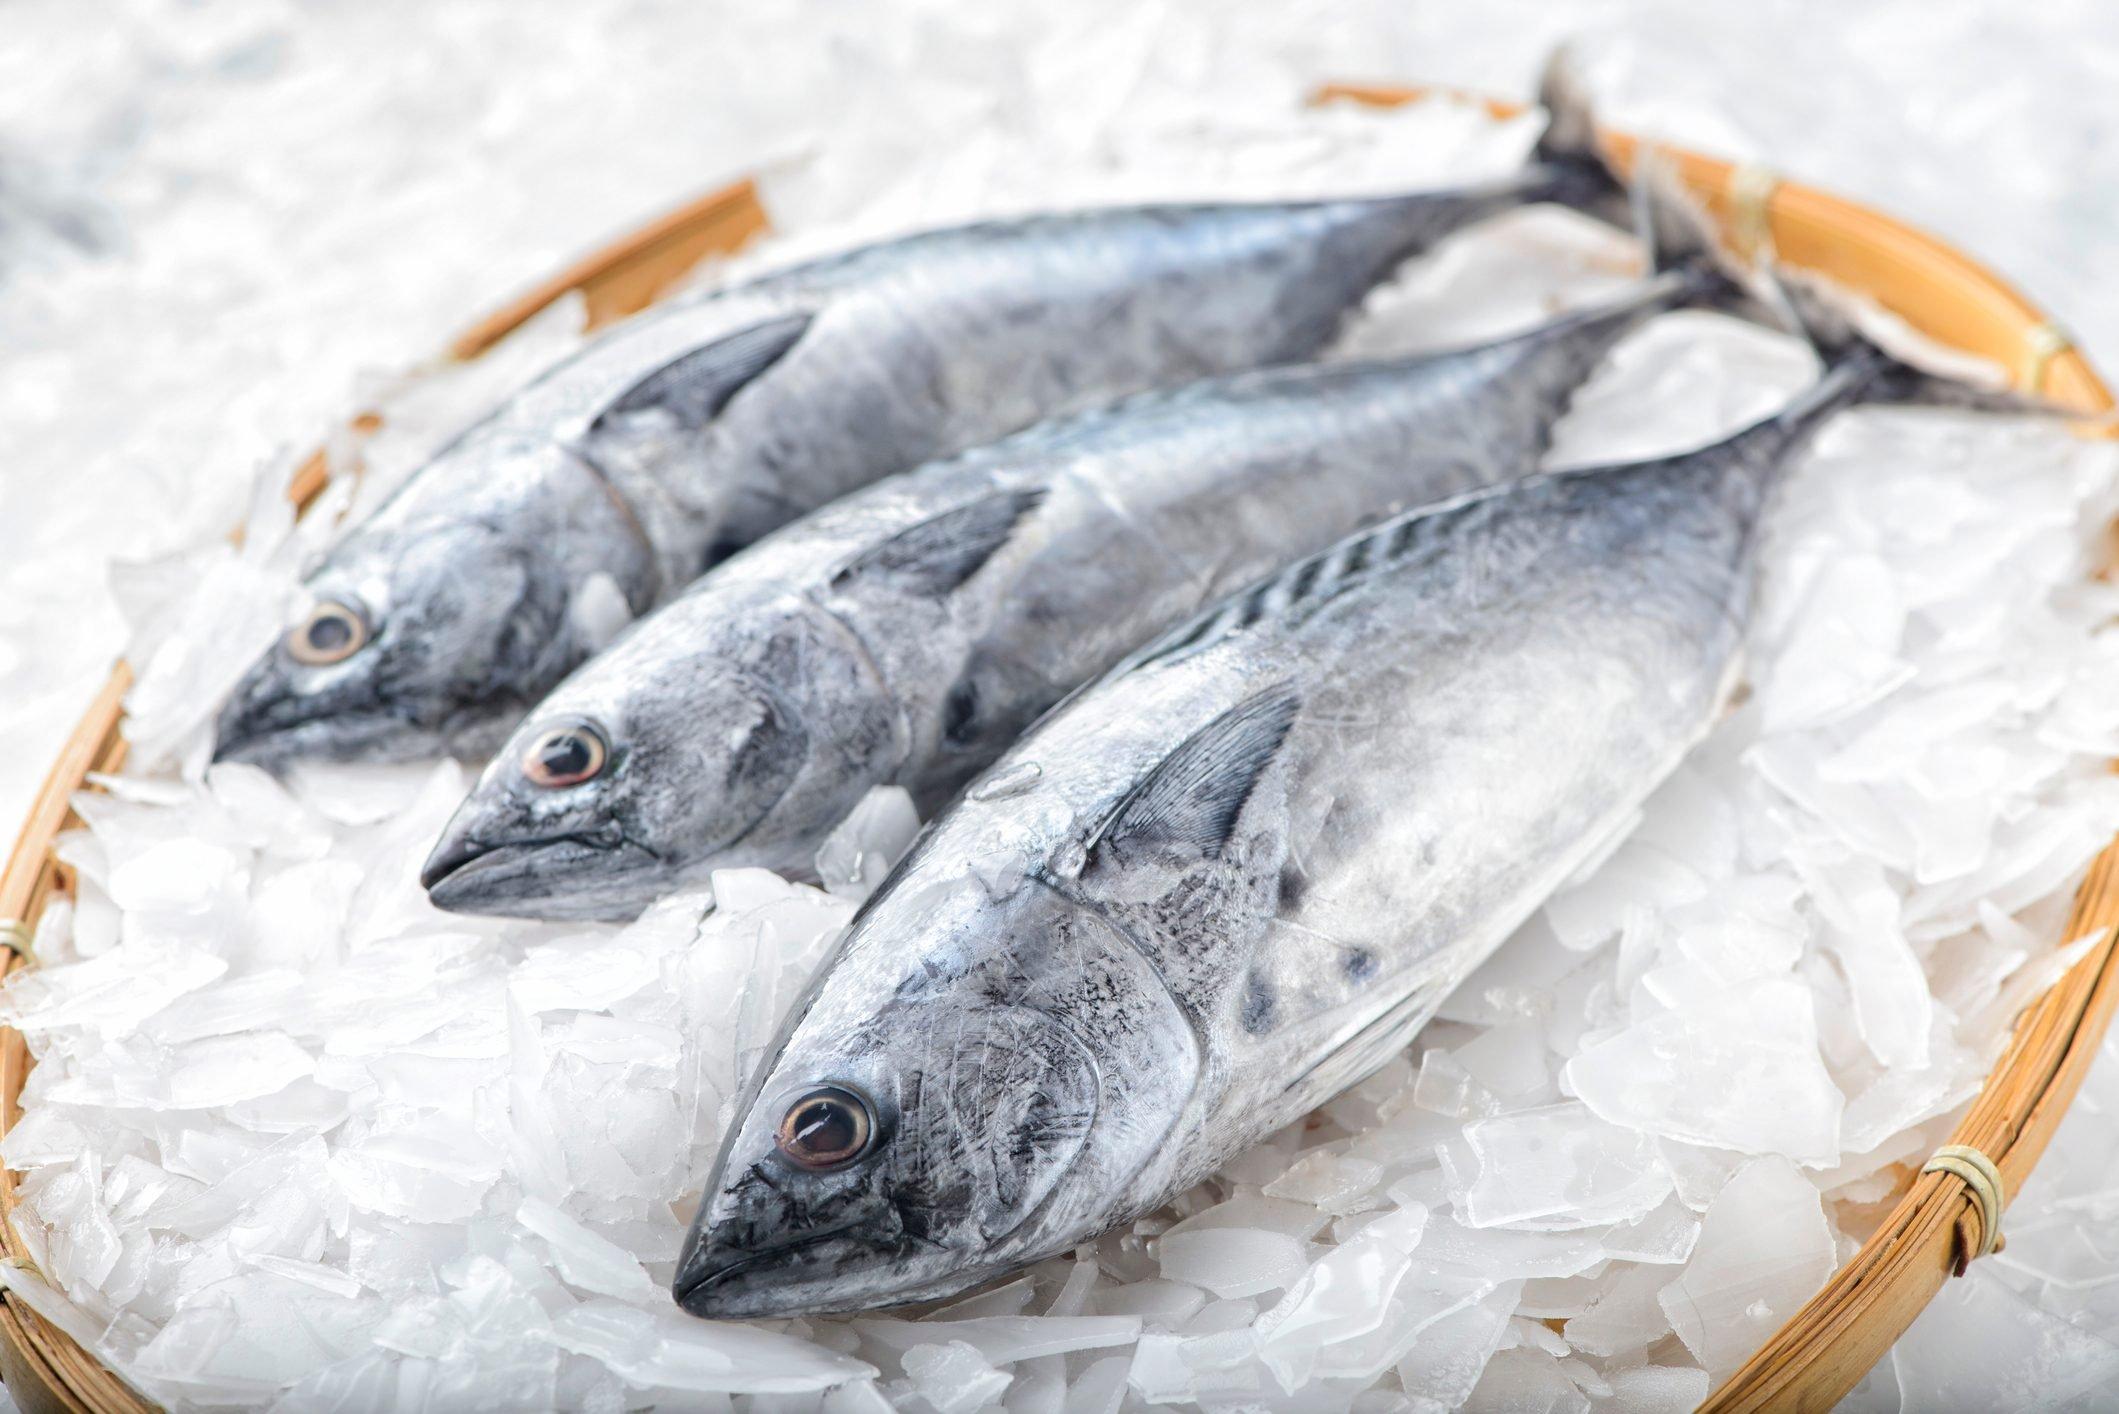 Three bonito tuna fish